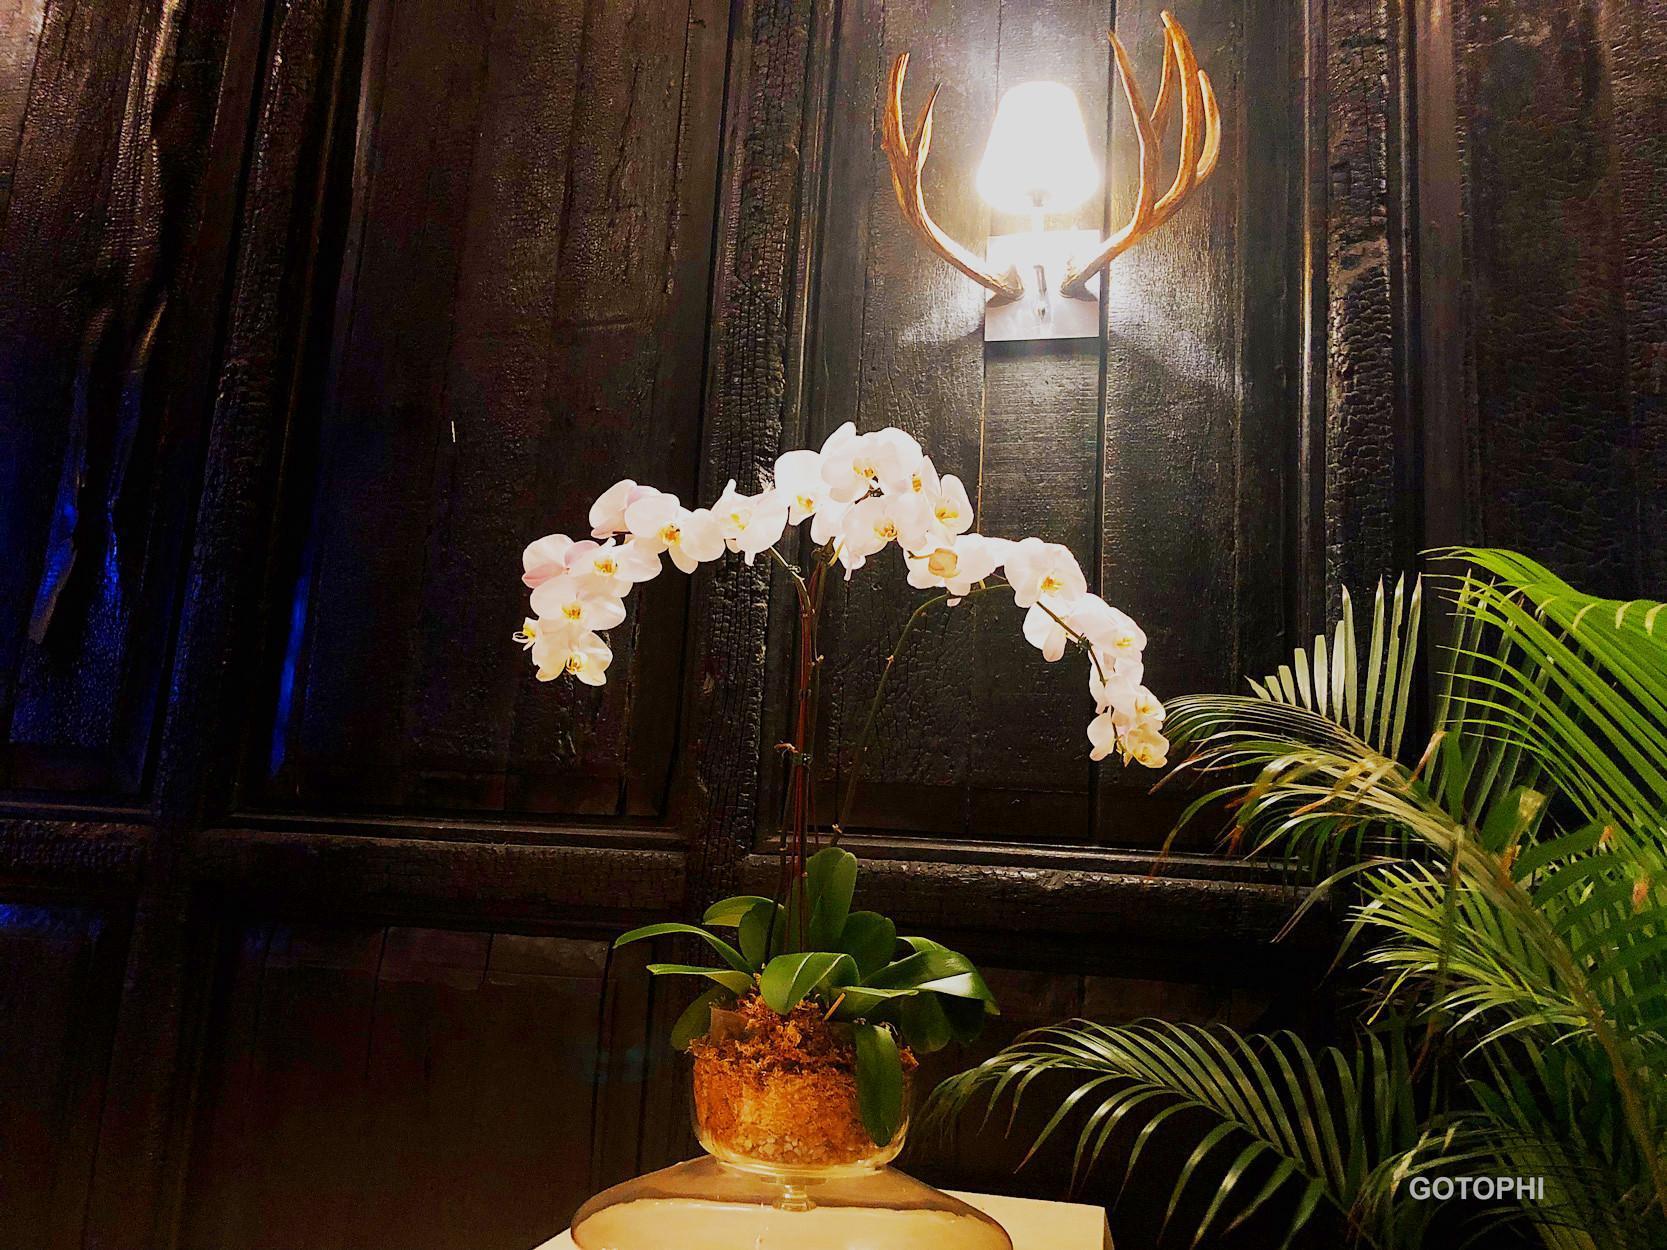 Gotophi Luxurious Hotel Knightsbridge Makati 5821